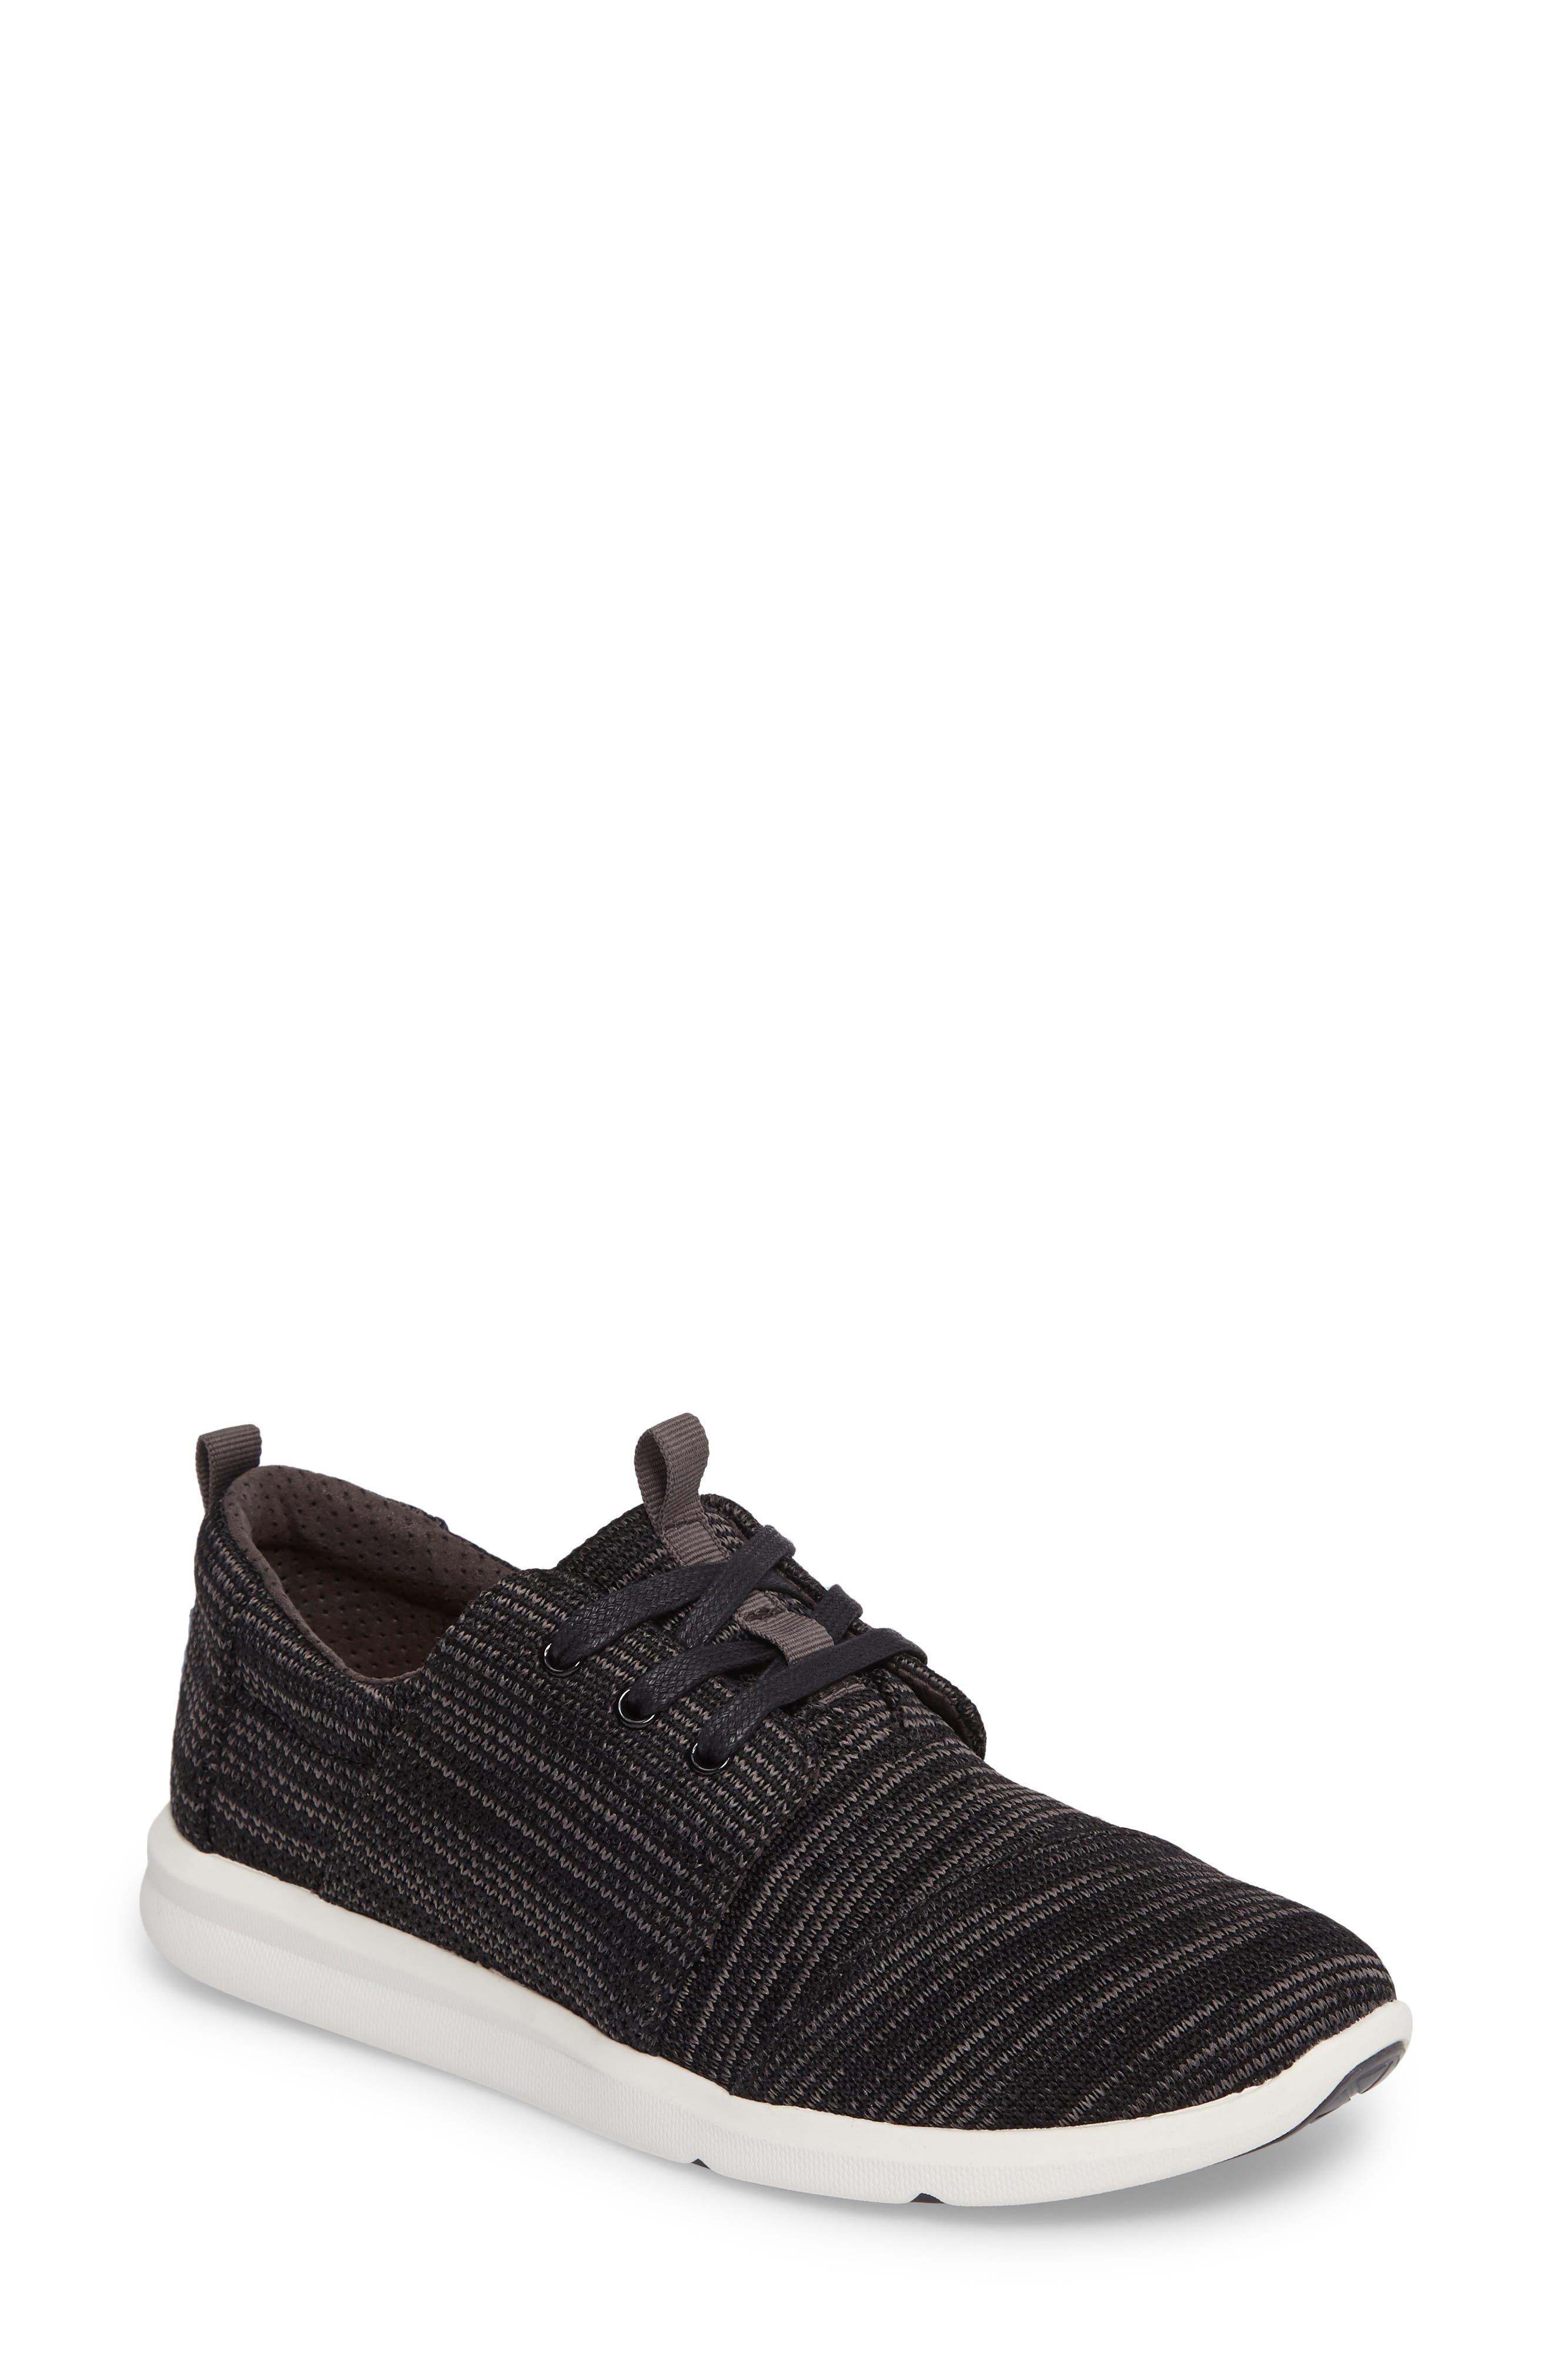 TOMS,                             'Del Ray' Sneaker,                             Main thumbnail 1, color,                             001